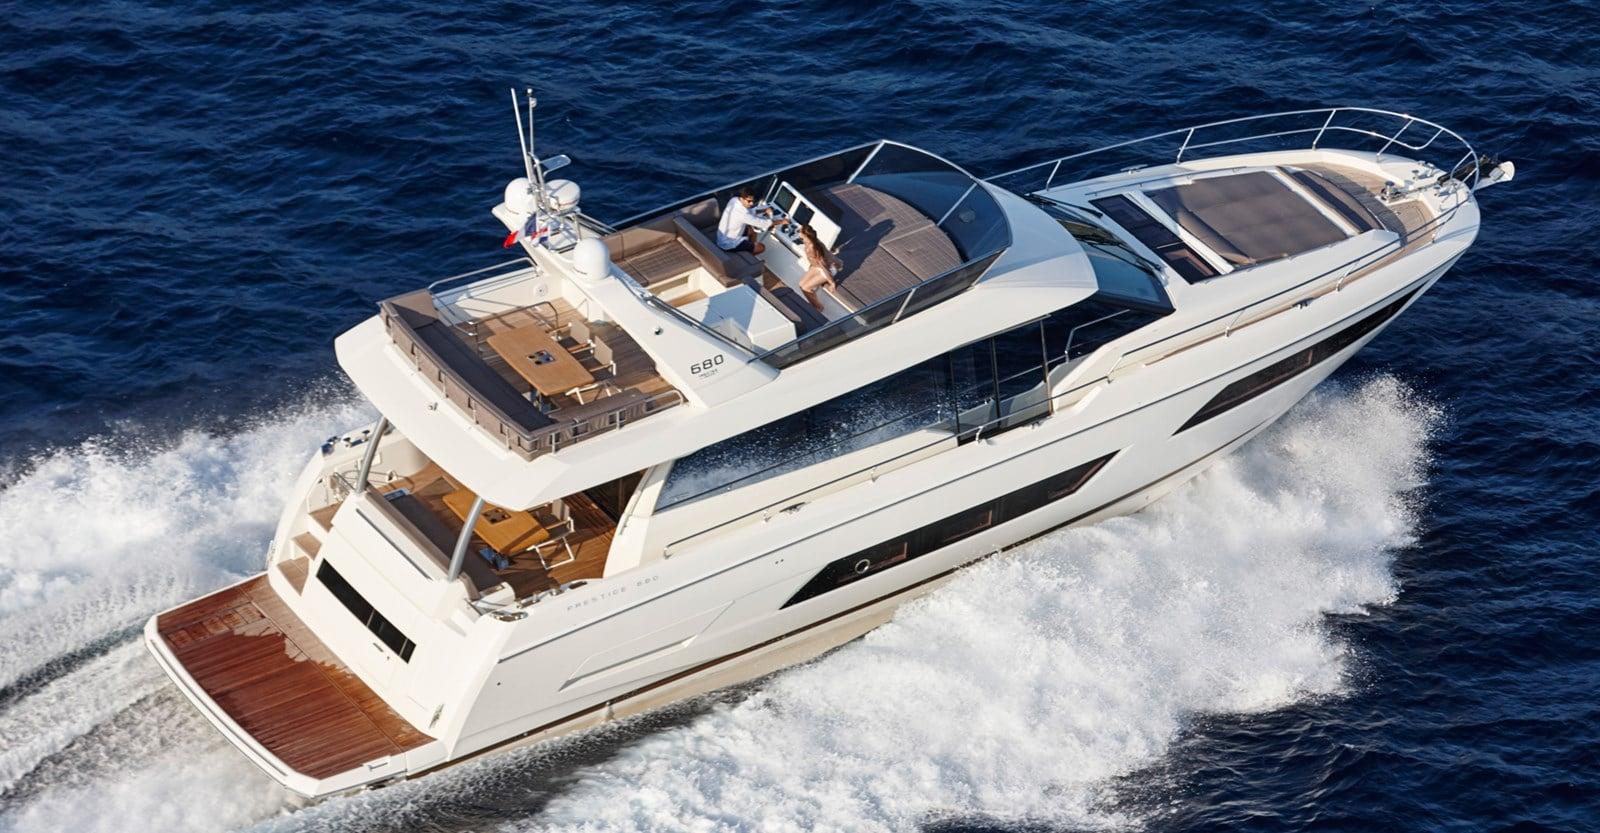 new prestige 680 yacht running